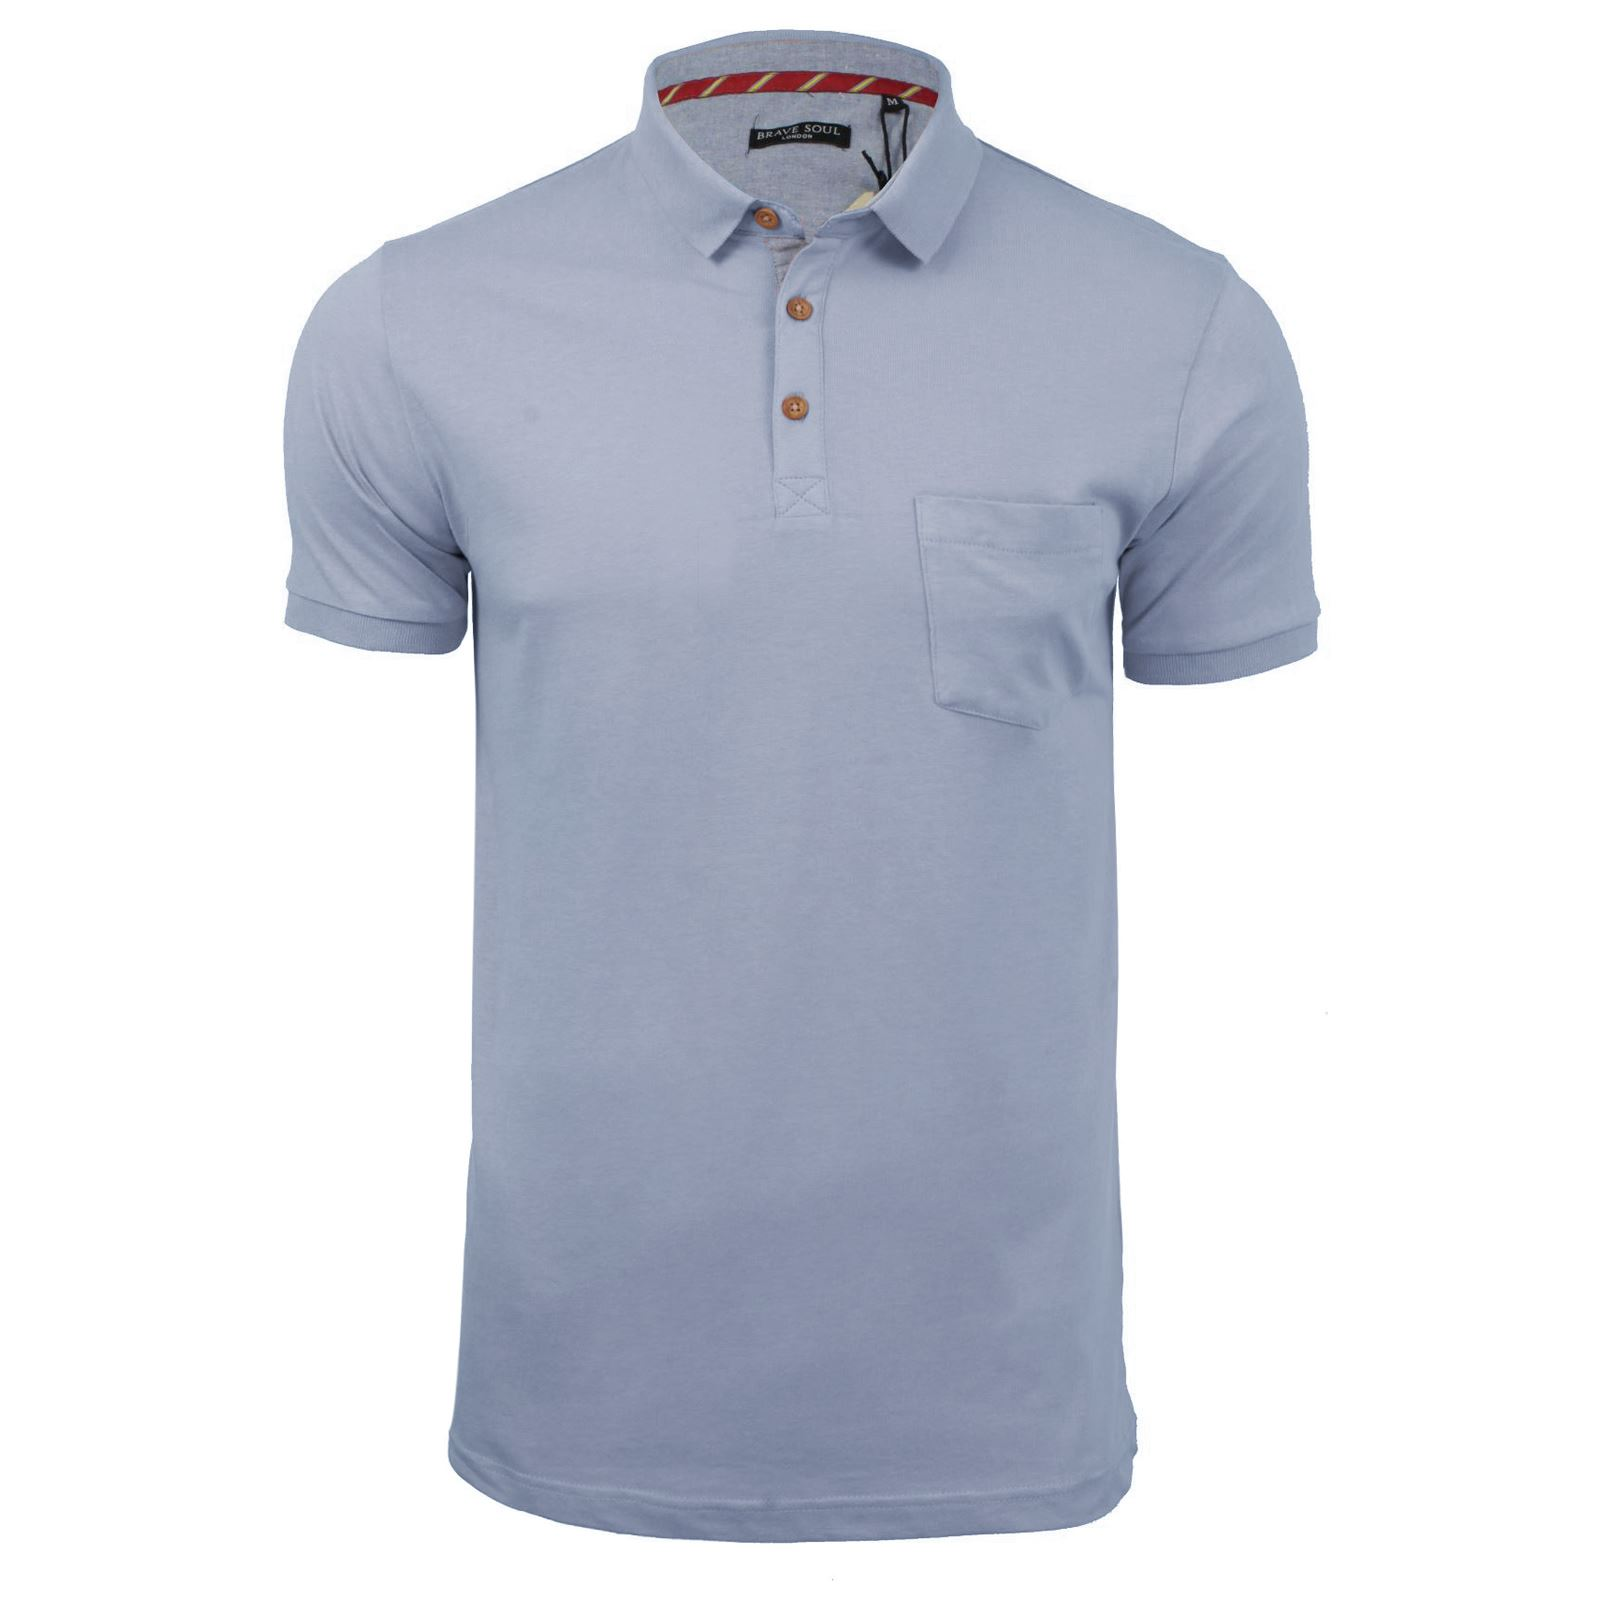 Para-Hombre-Polo-T-Shirt-Alma-valiente-Glover-Algodon-Con-Cuello-Y-Manga-Corta-Casual-Top miniatura 54